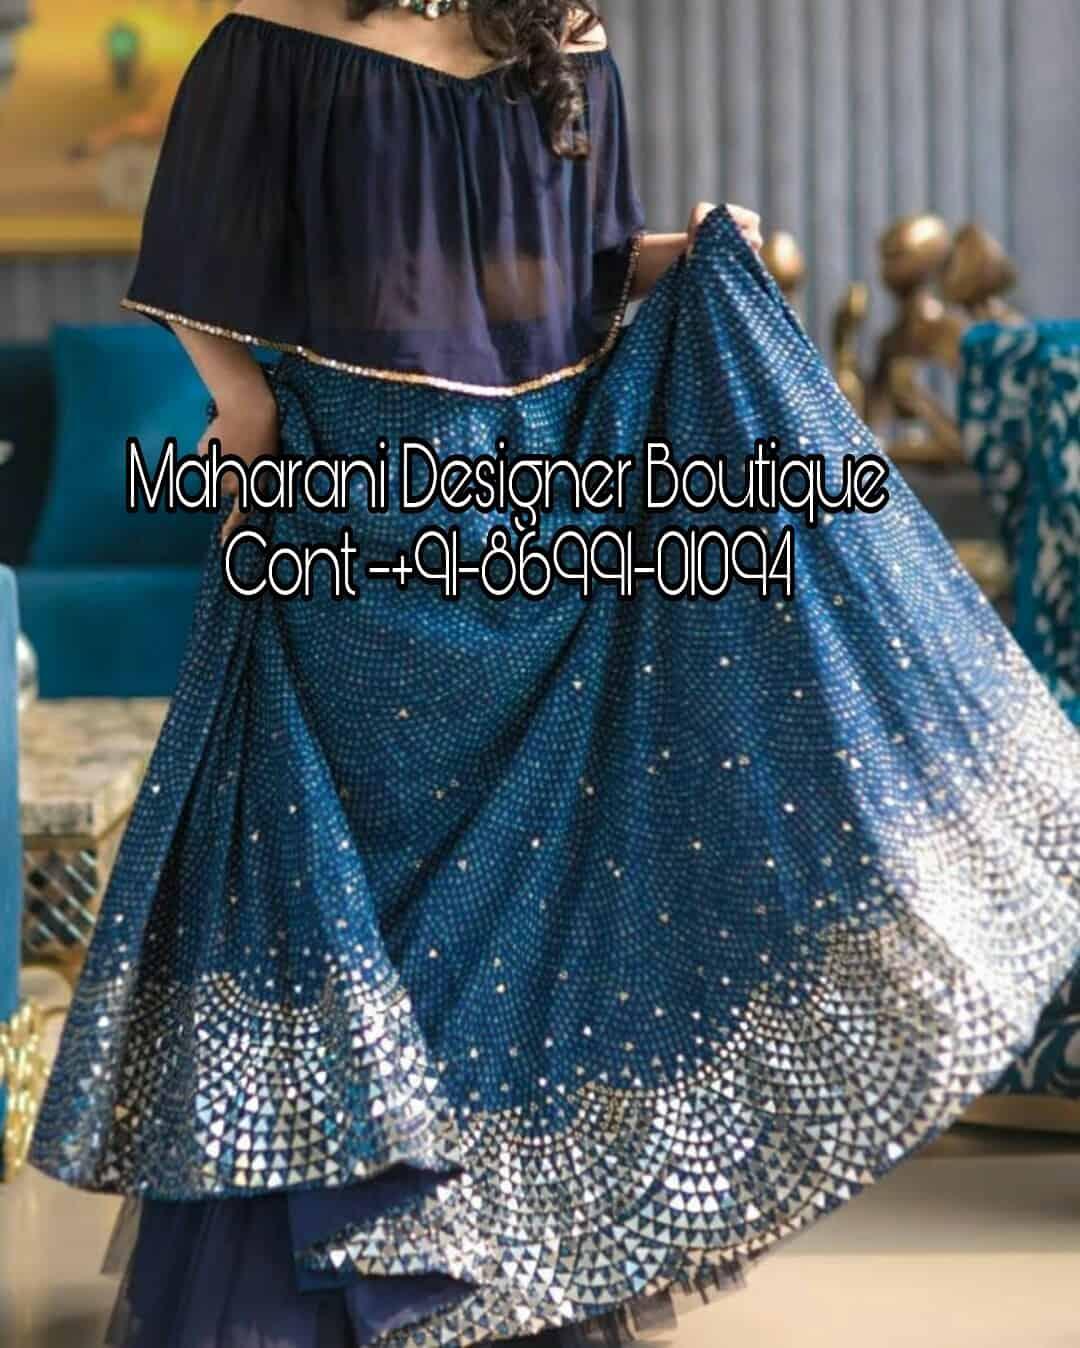 163cf9212 Party Wear Lehenga In Jaipur, party wear lehenga for 15 year girl, party  wear